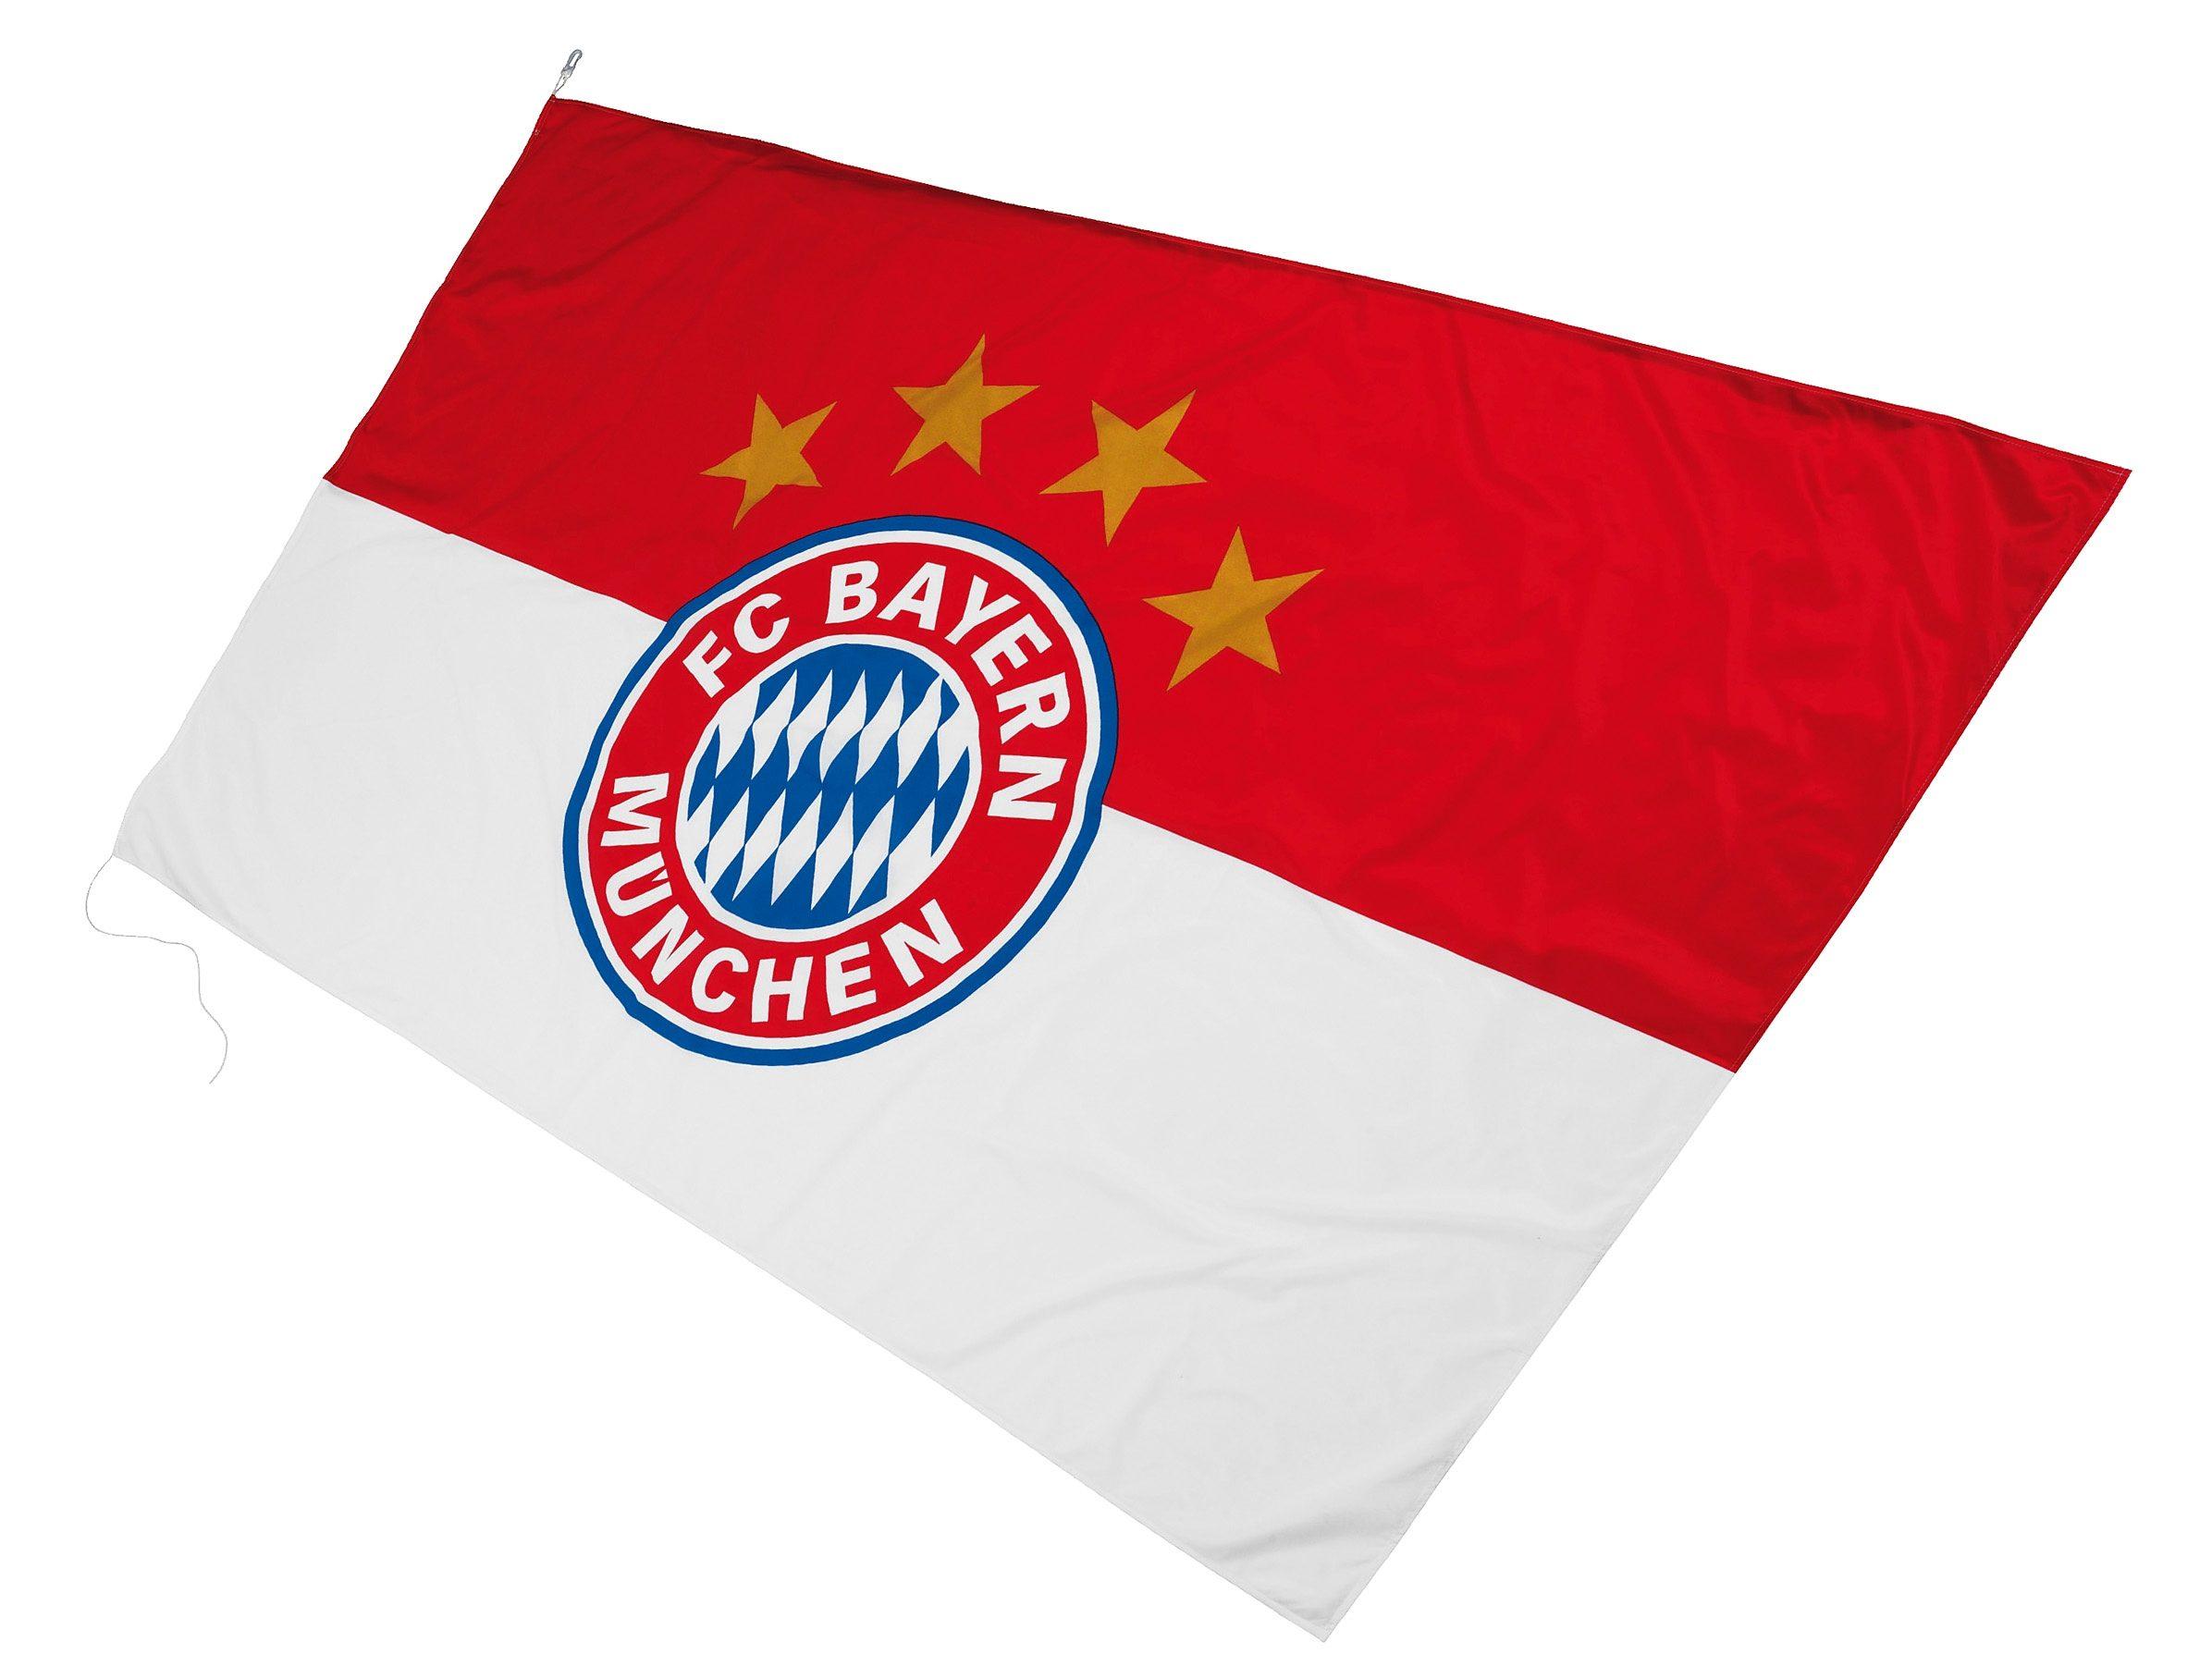 FC Bayern Fahne Hissfahne mit Logo rot Kinder Bundesliga-Fanshop Fanartikel Fahnen